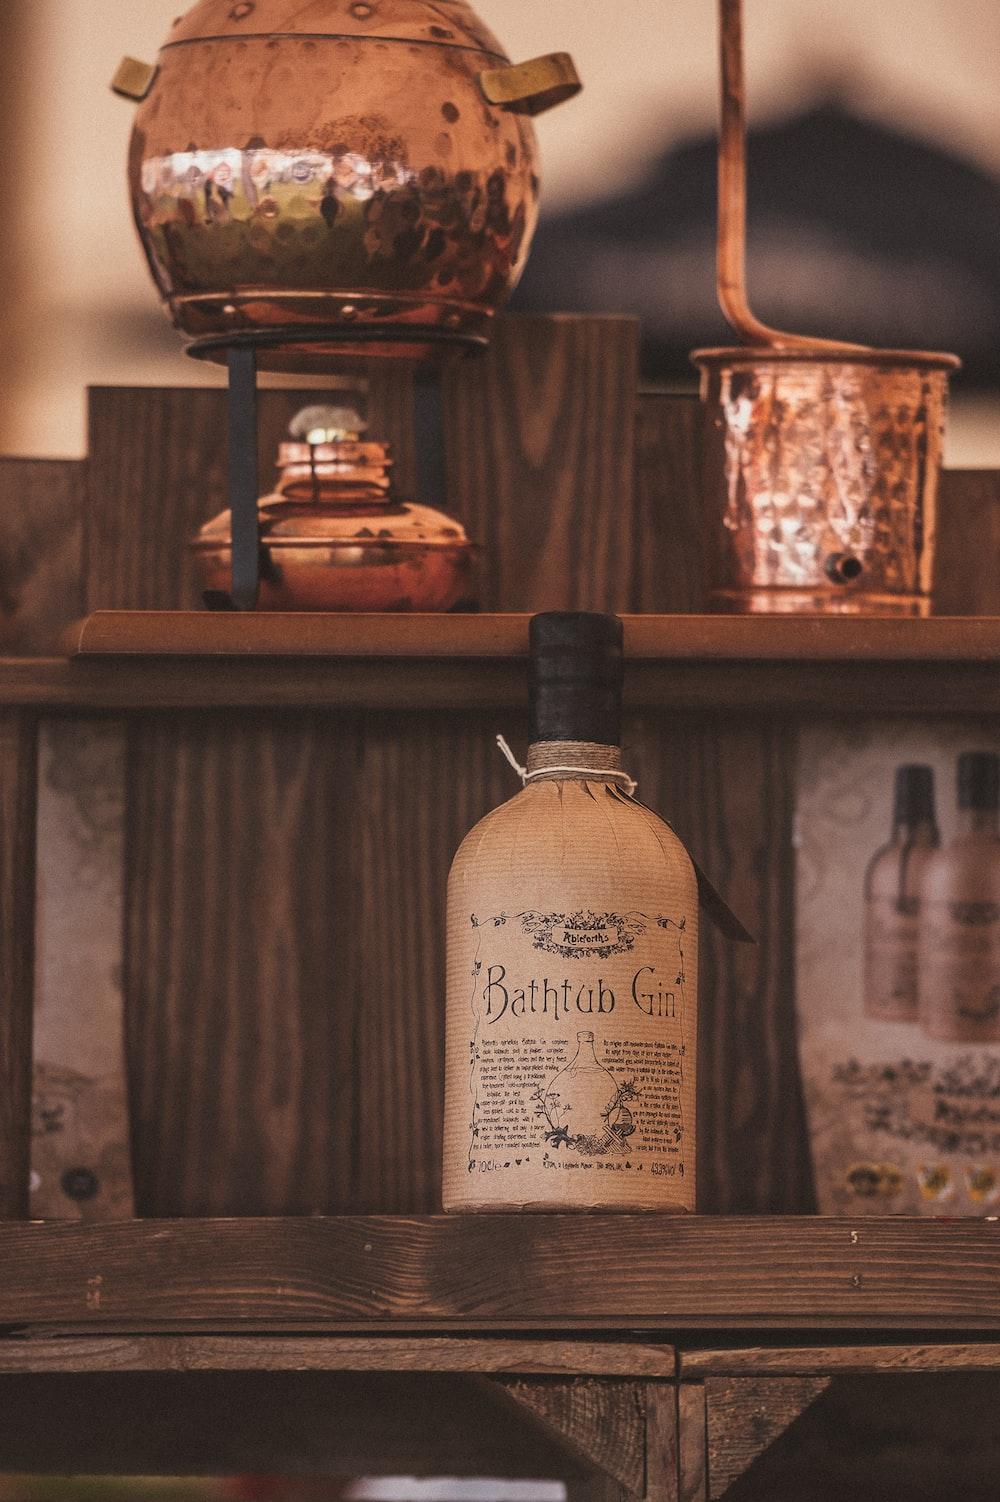 Bathtub Gin bottle on brown wooden surface